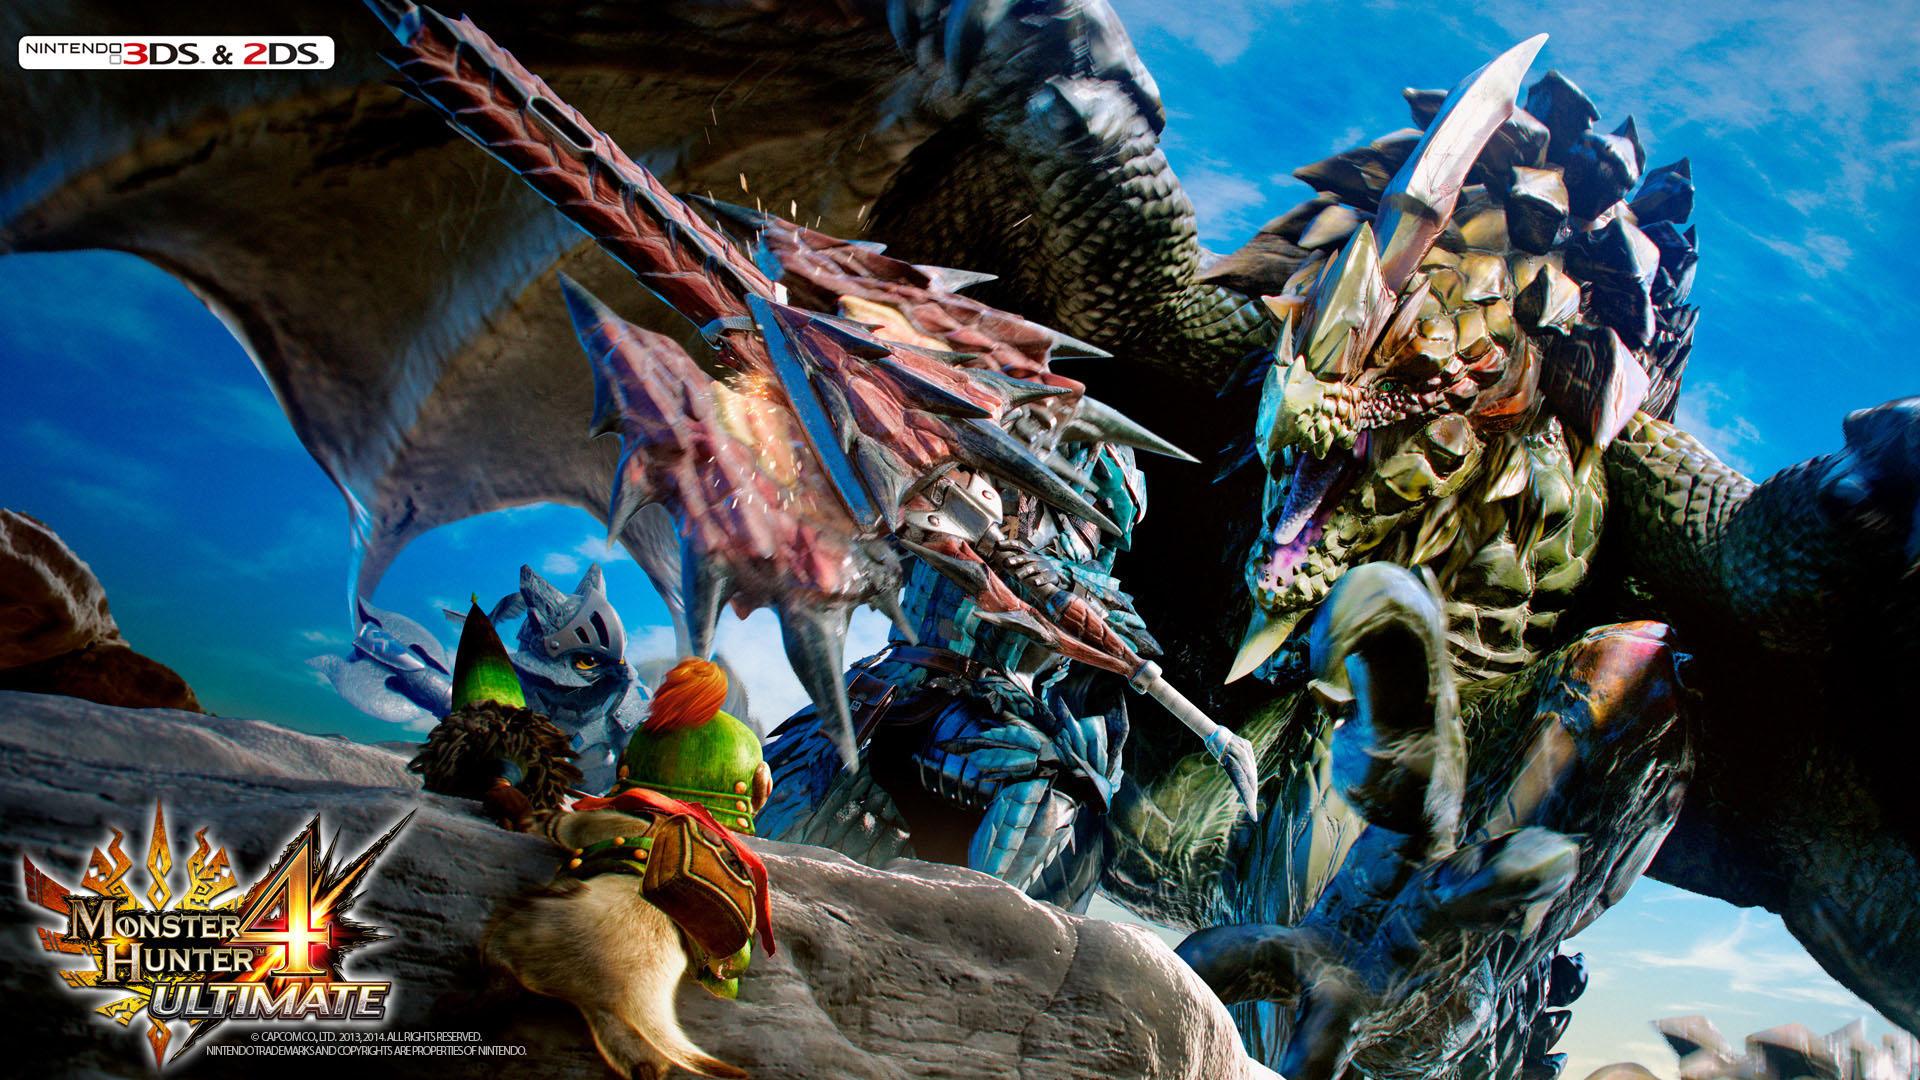 Free Download Pics Photos Monster Hunter 4 Wallpaper For Desktop